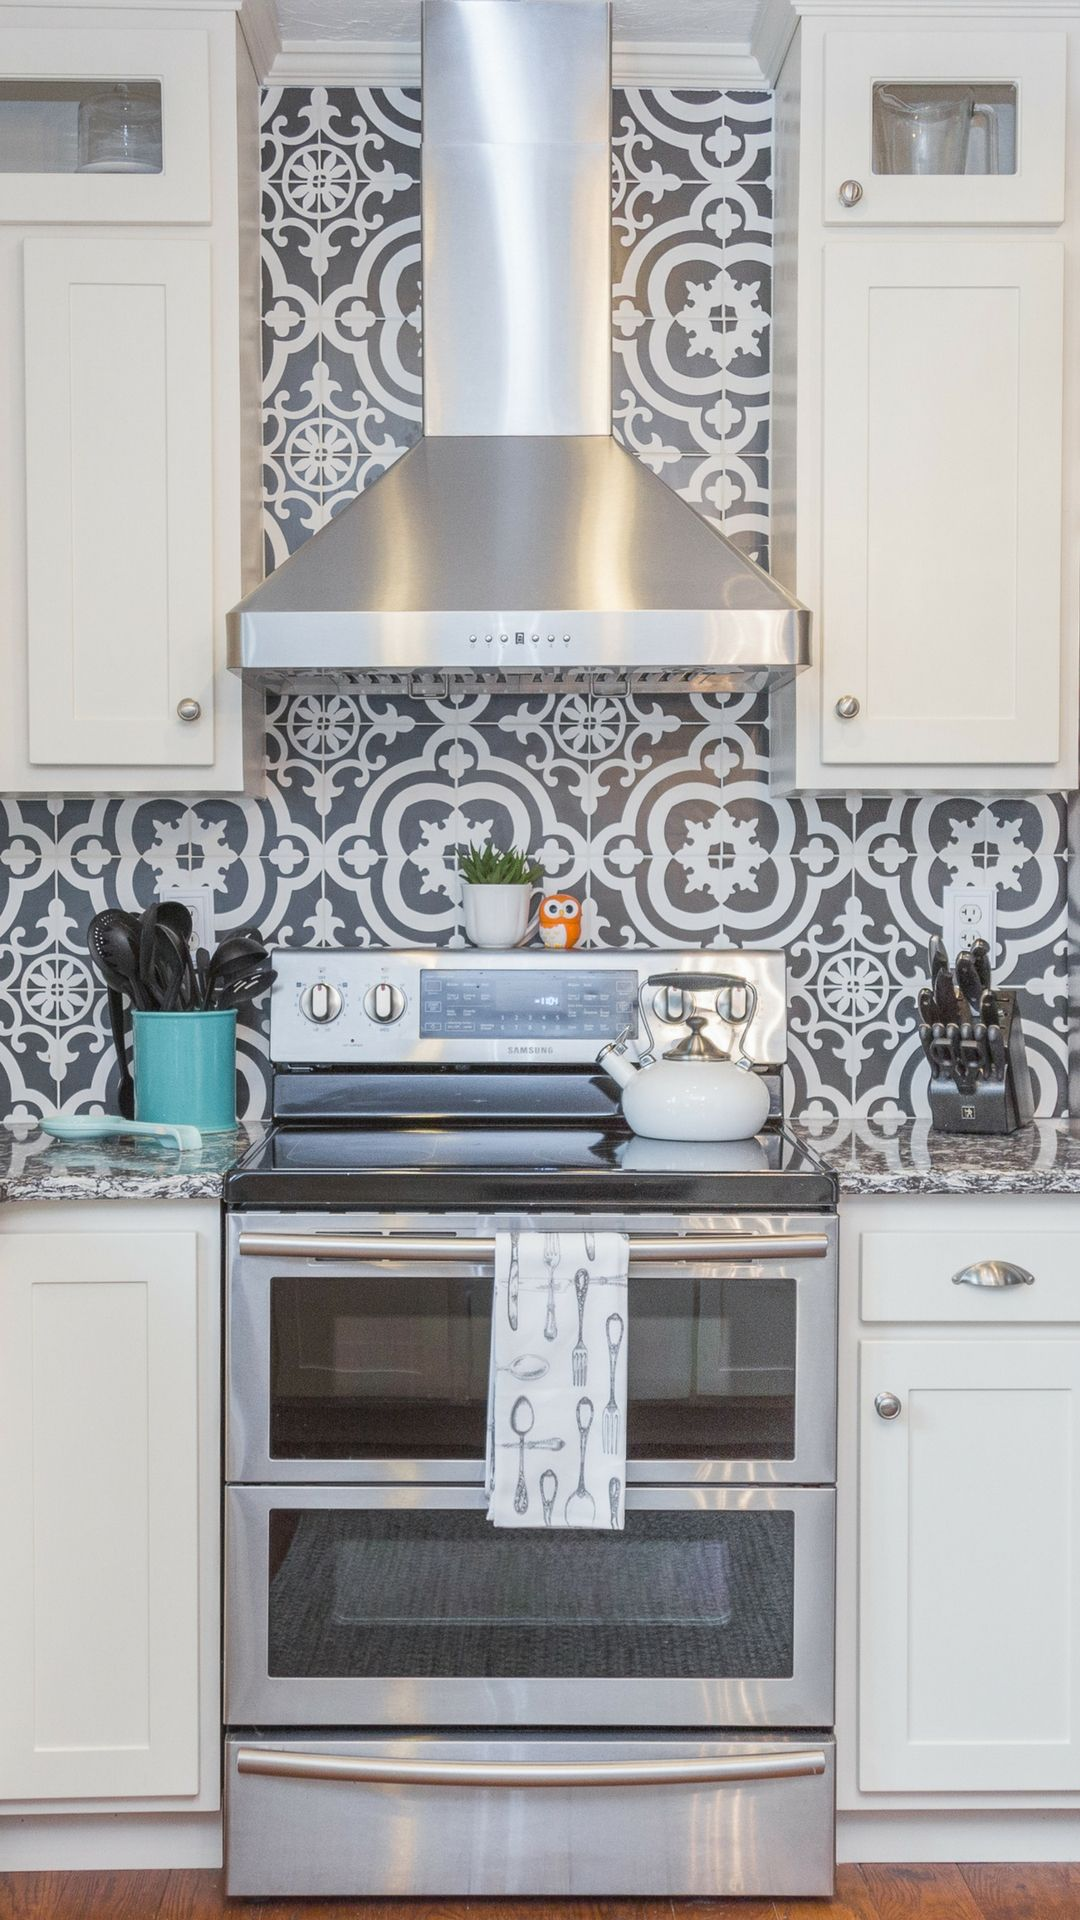 Kitchen Magic Cabinet Refacing Project Kitchen Refacing Diy Kitchen Backsplash Cheap Easy Kitchen Backsplash